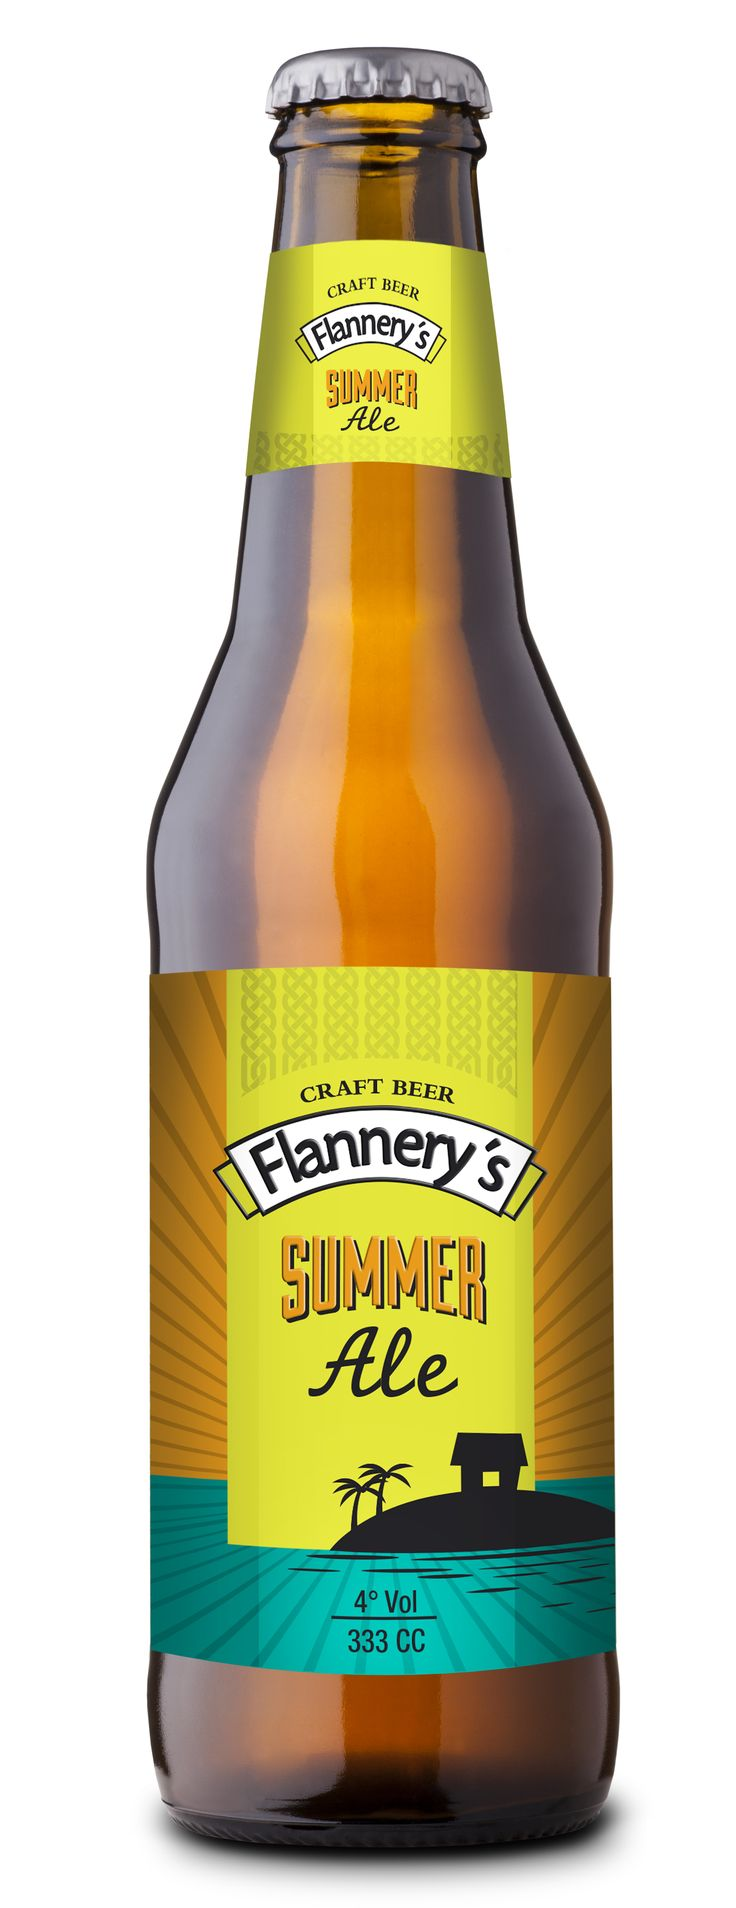 Flannery's Summer Ale #craft #beer #craftbeer #cerveza #artesanal #Flannerys #Summer Ale